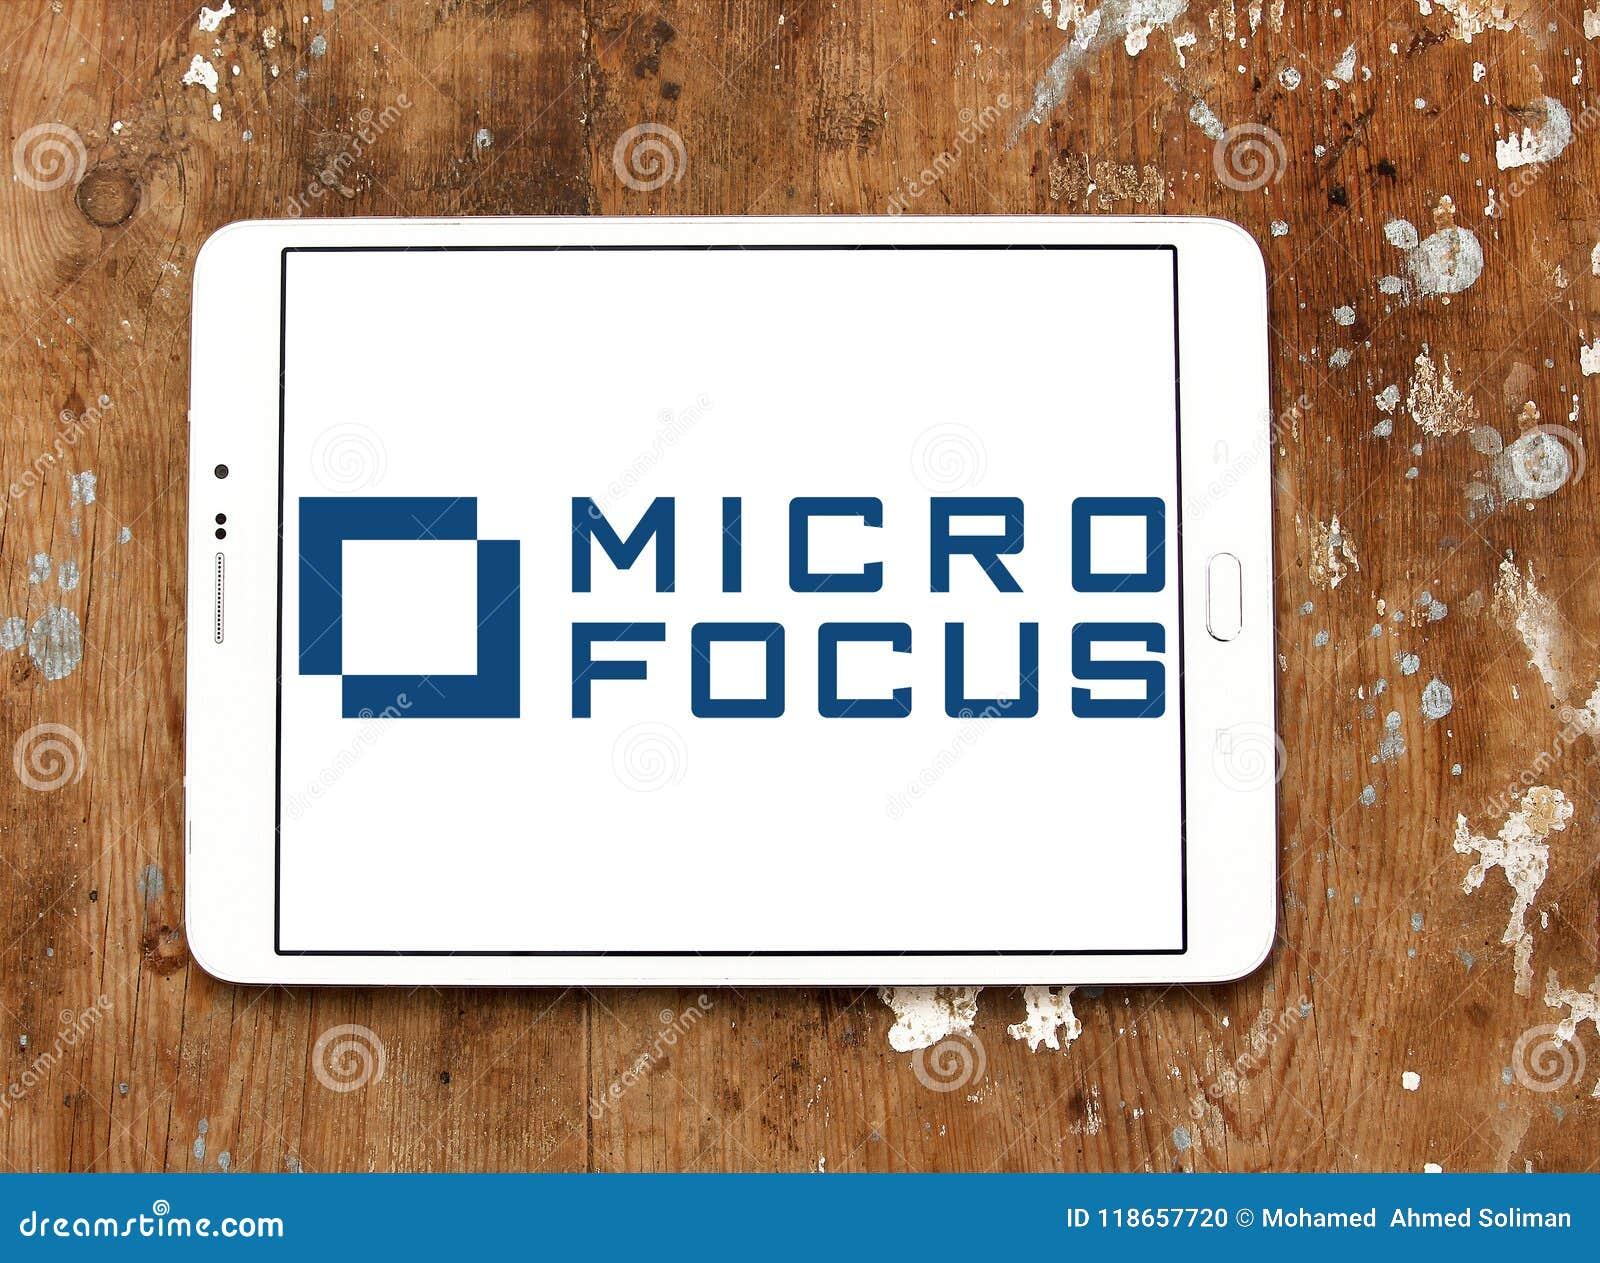 Micro Focus company logo editorial image  Image of